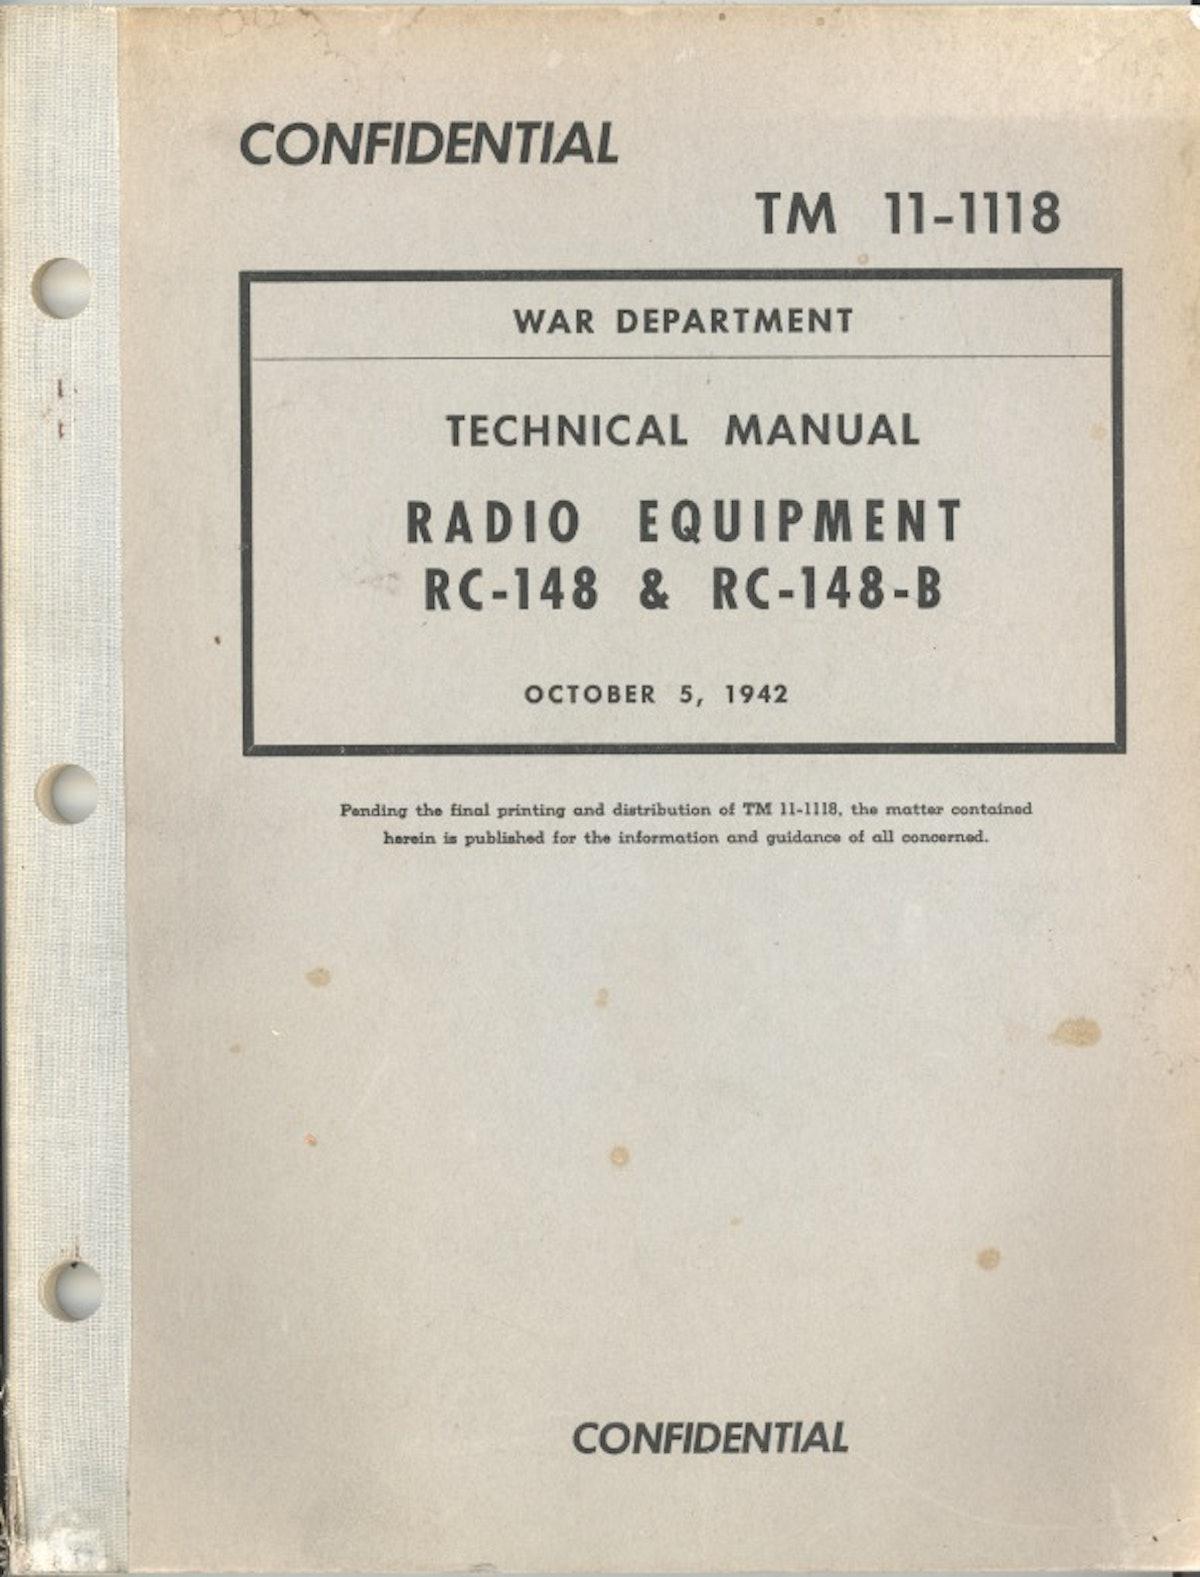 Technical Manual: Radio Equipment RC-148 & RC-148-B